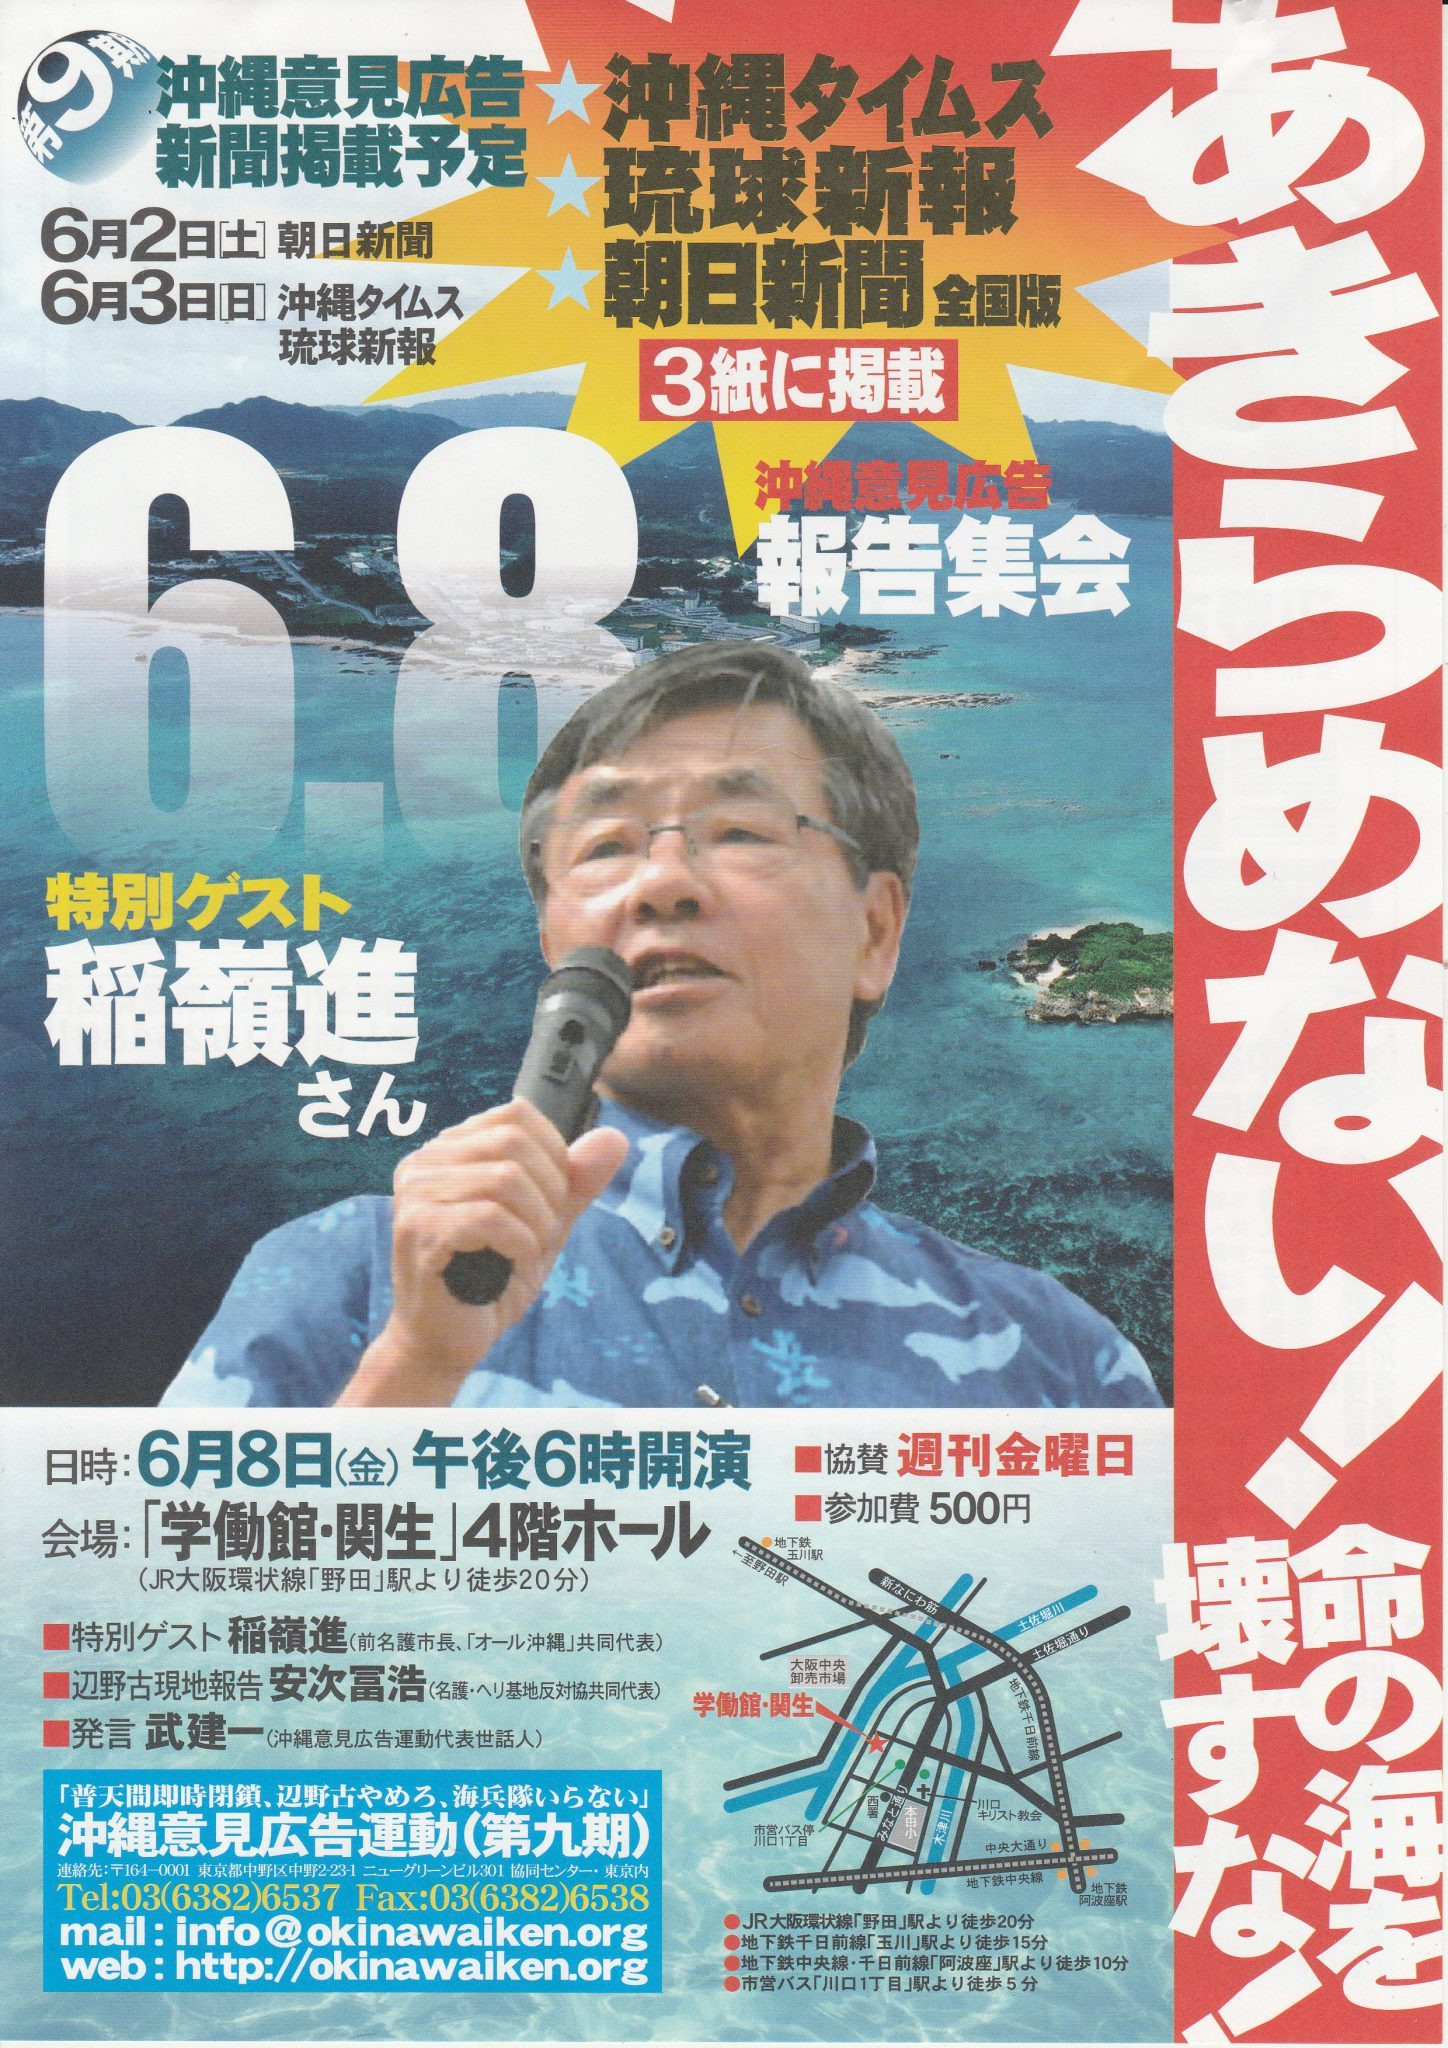 沖縄意見広告関西報告集会チラシ